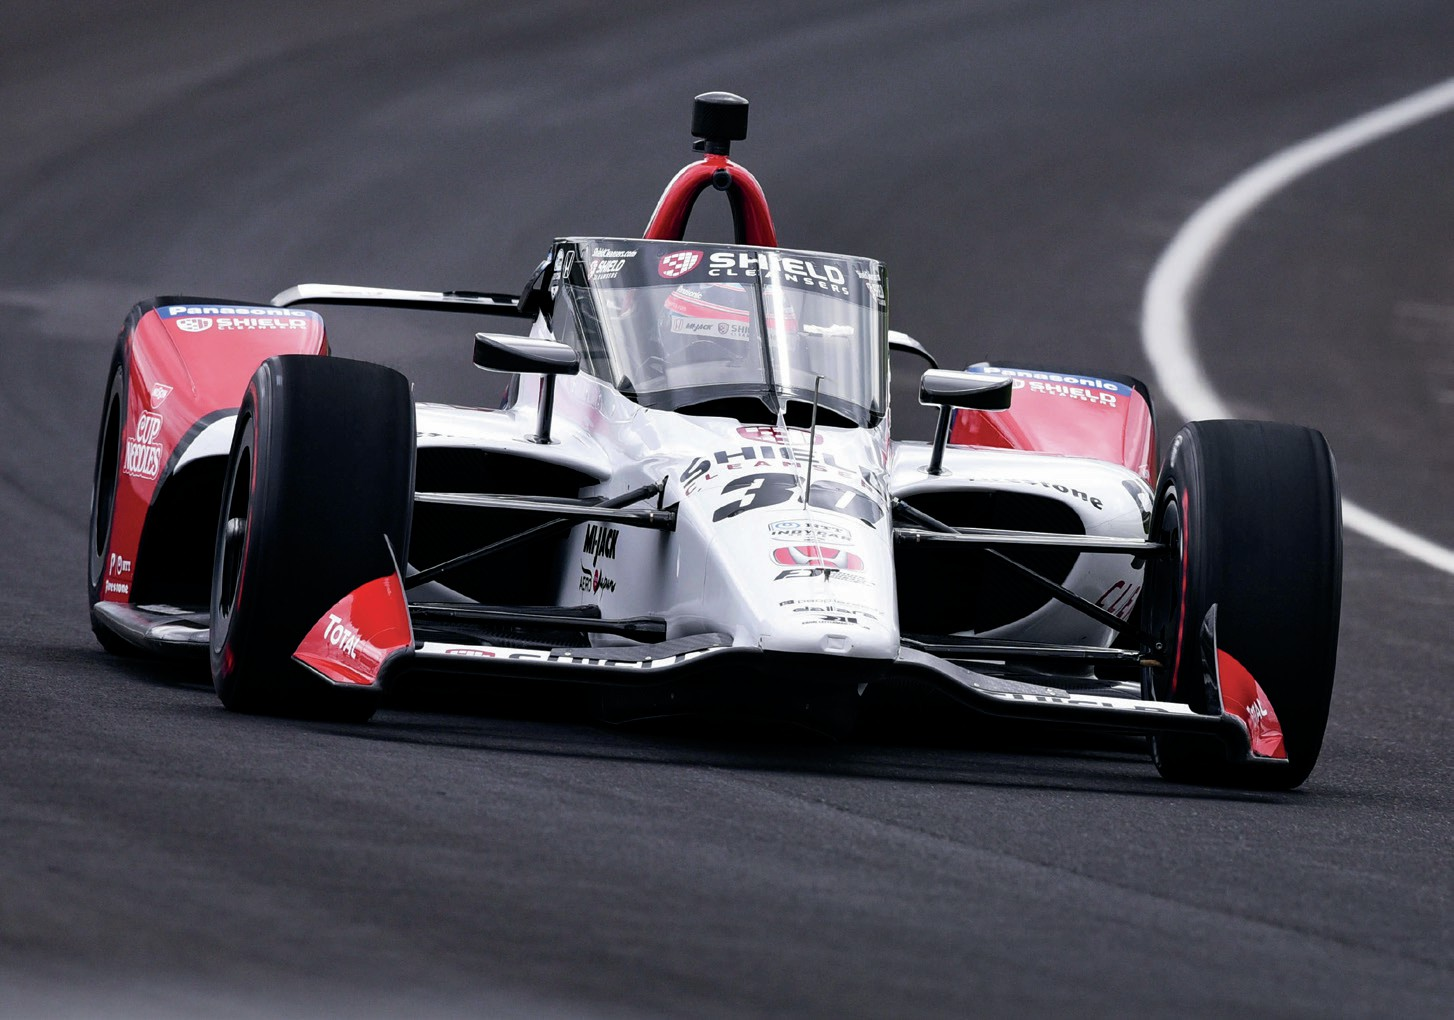 Takuma Sato Indy 500